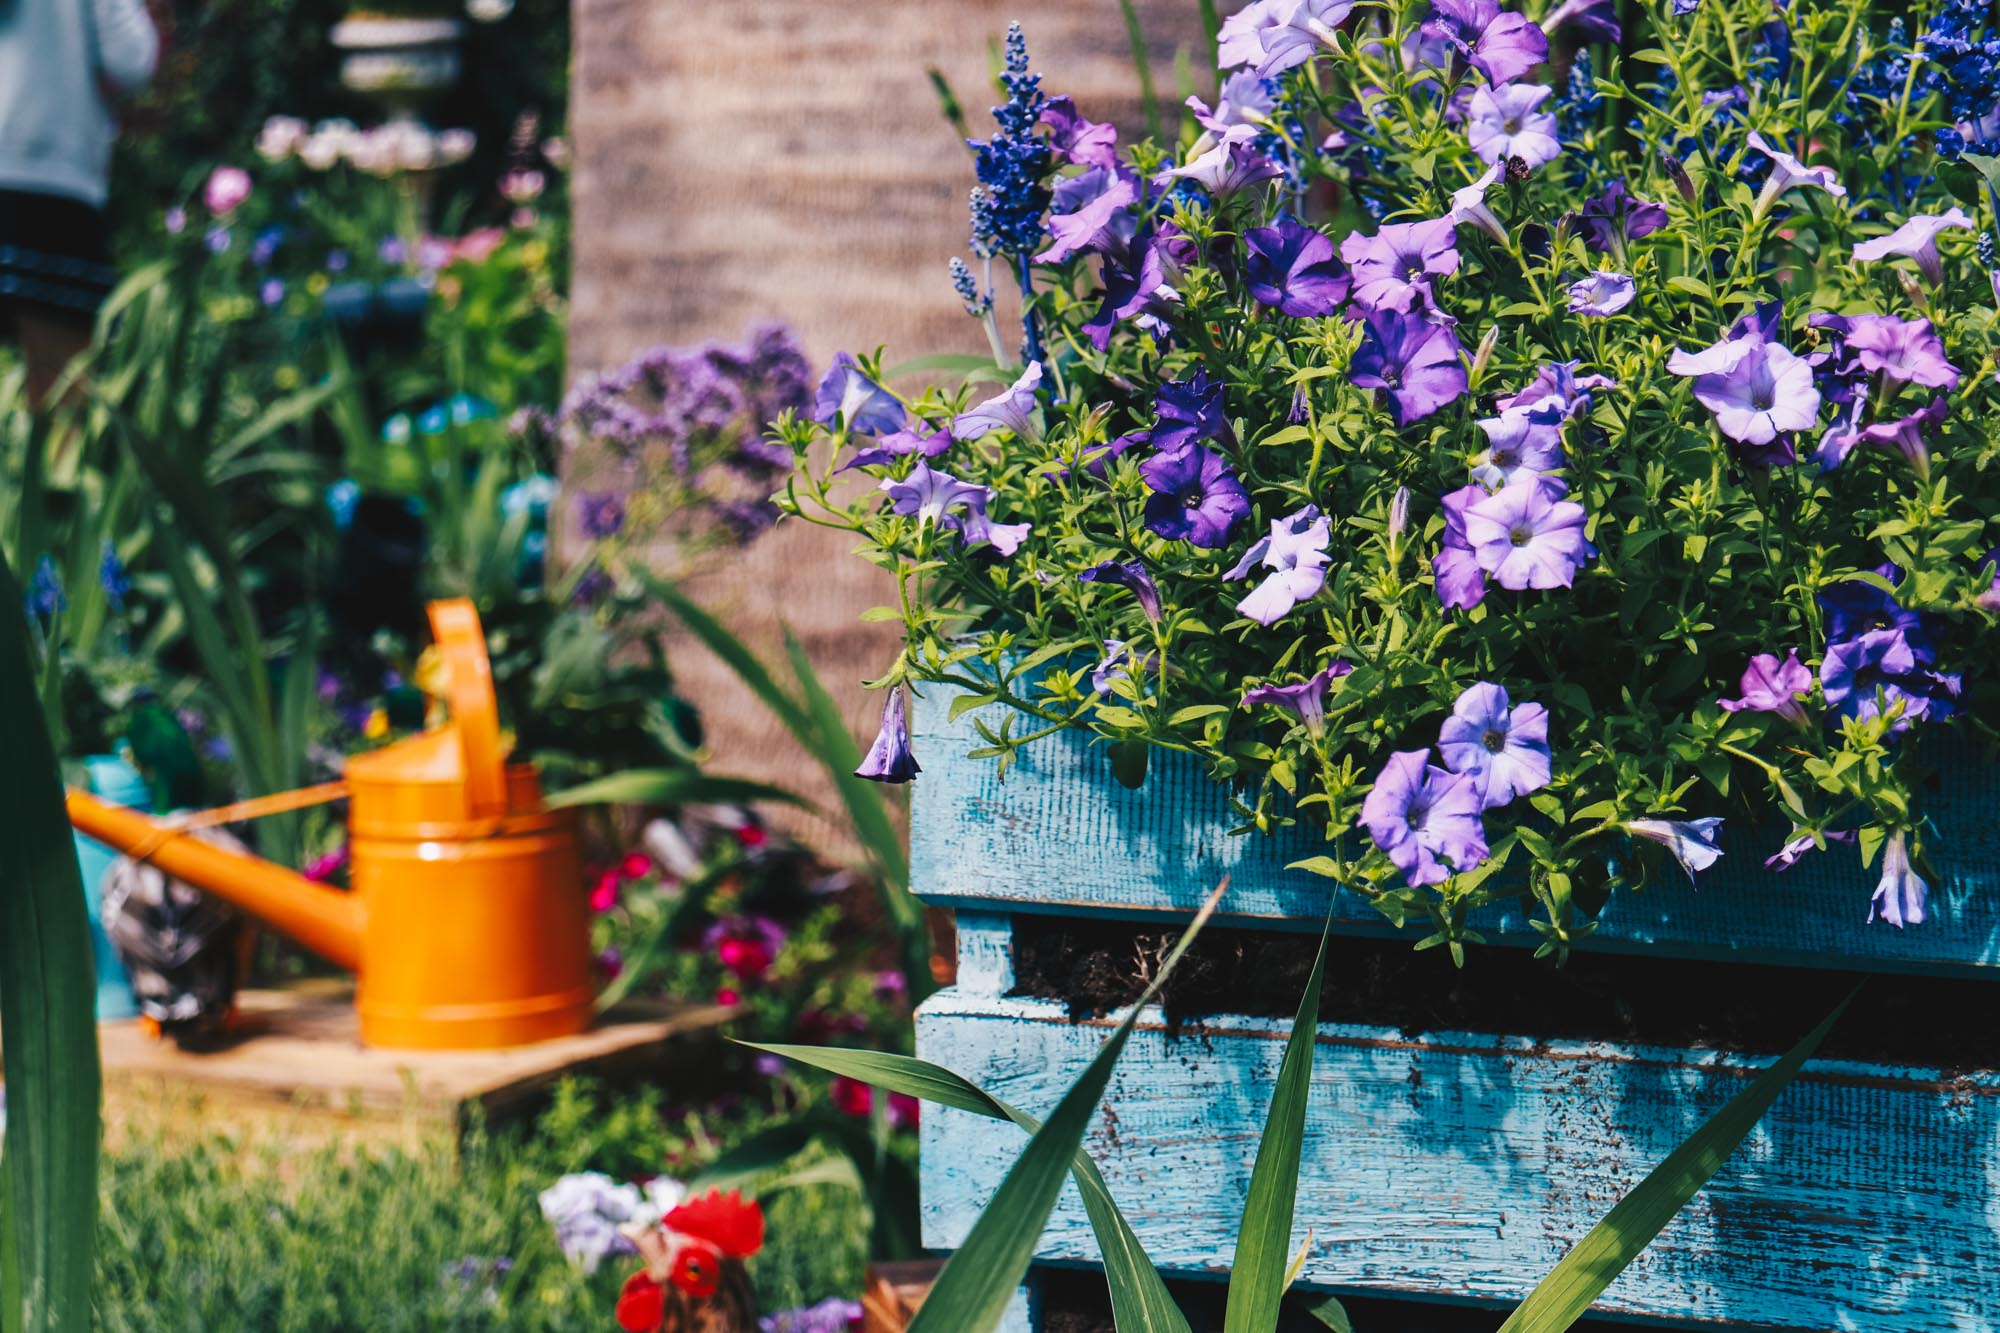 Blue-beauties-floral-display-gardensbythebay-darrenbloggie14